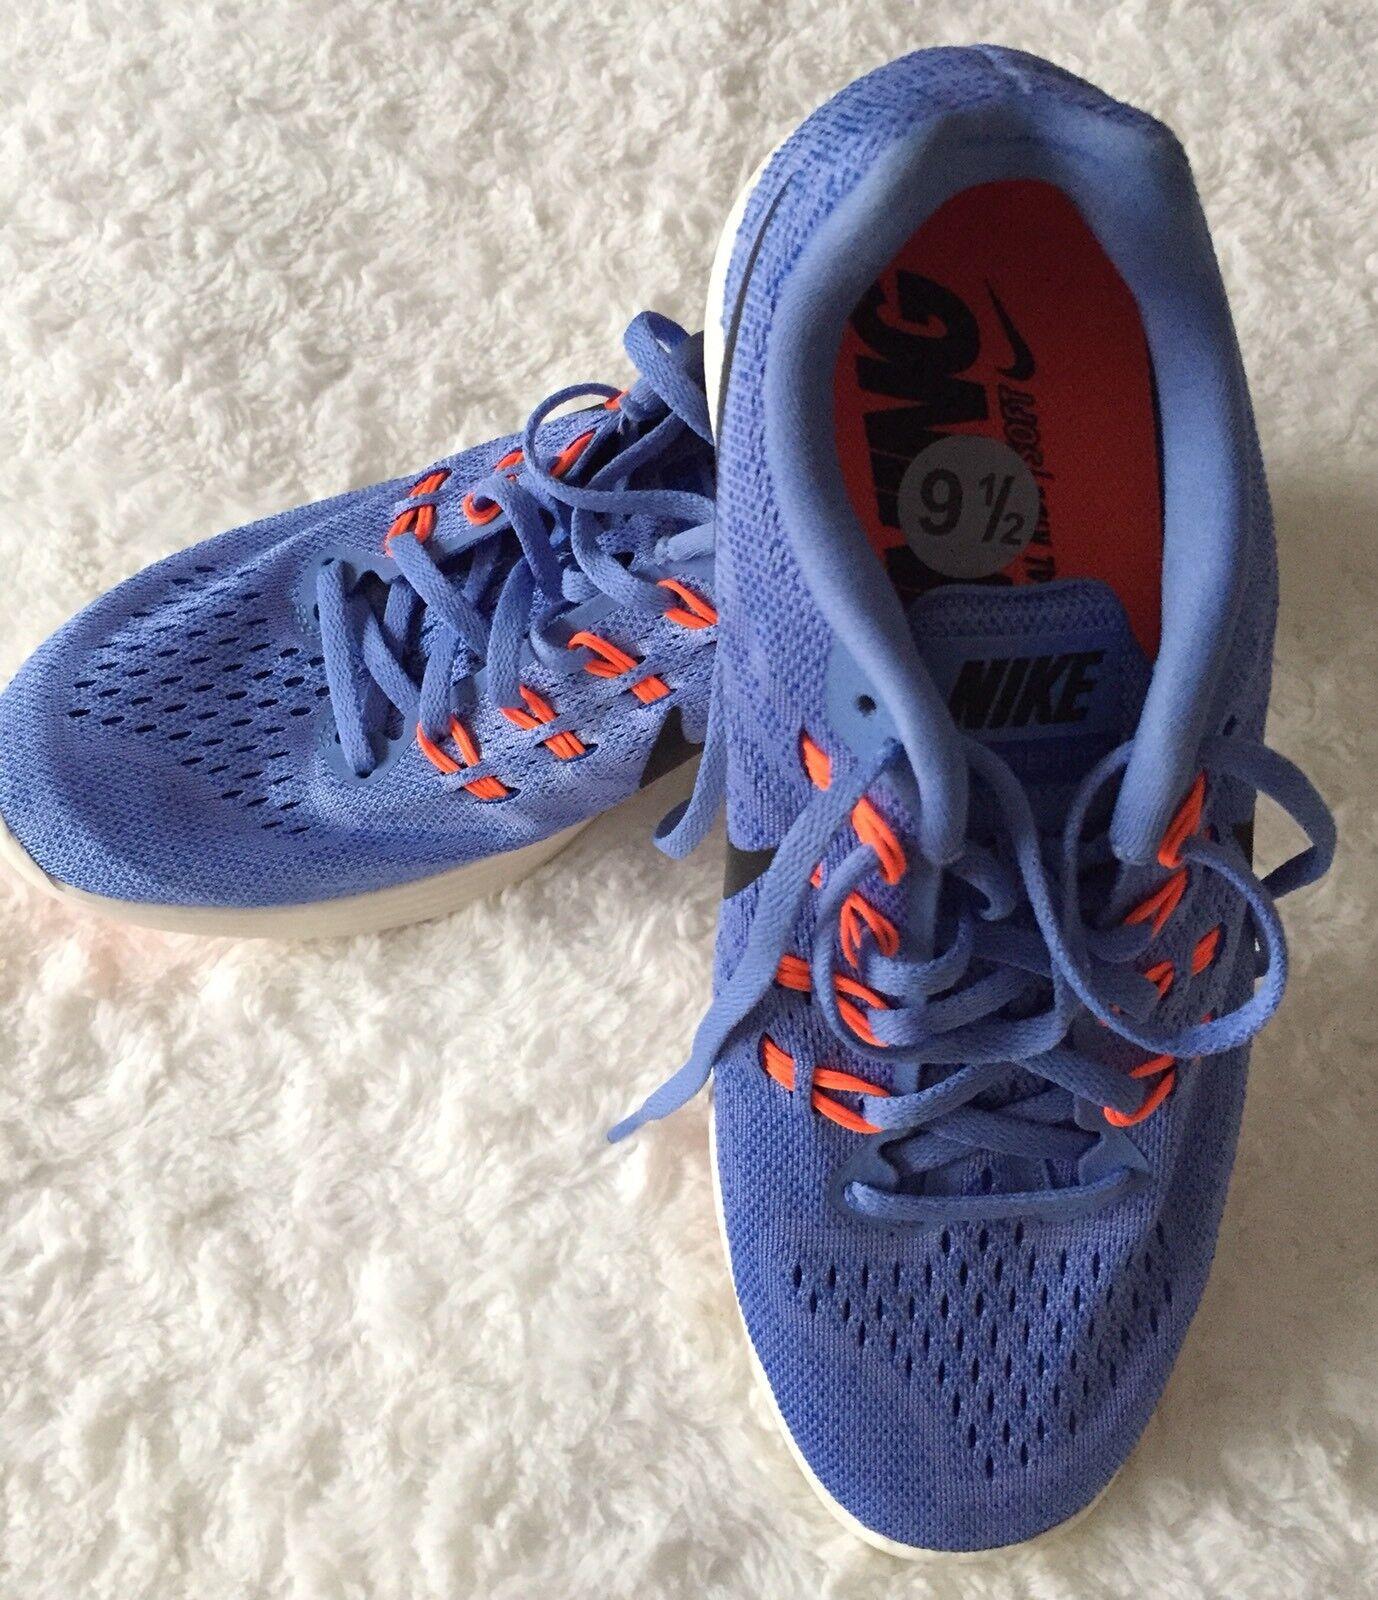 Nike Lunartempo 2 Light Weight Purple Running shoes Size 9,5 Women's